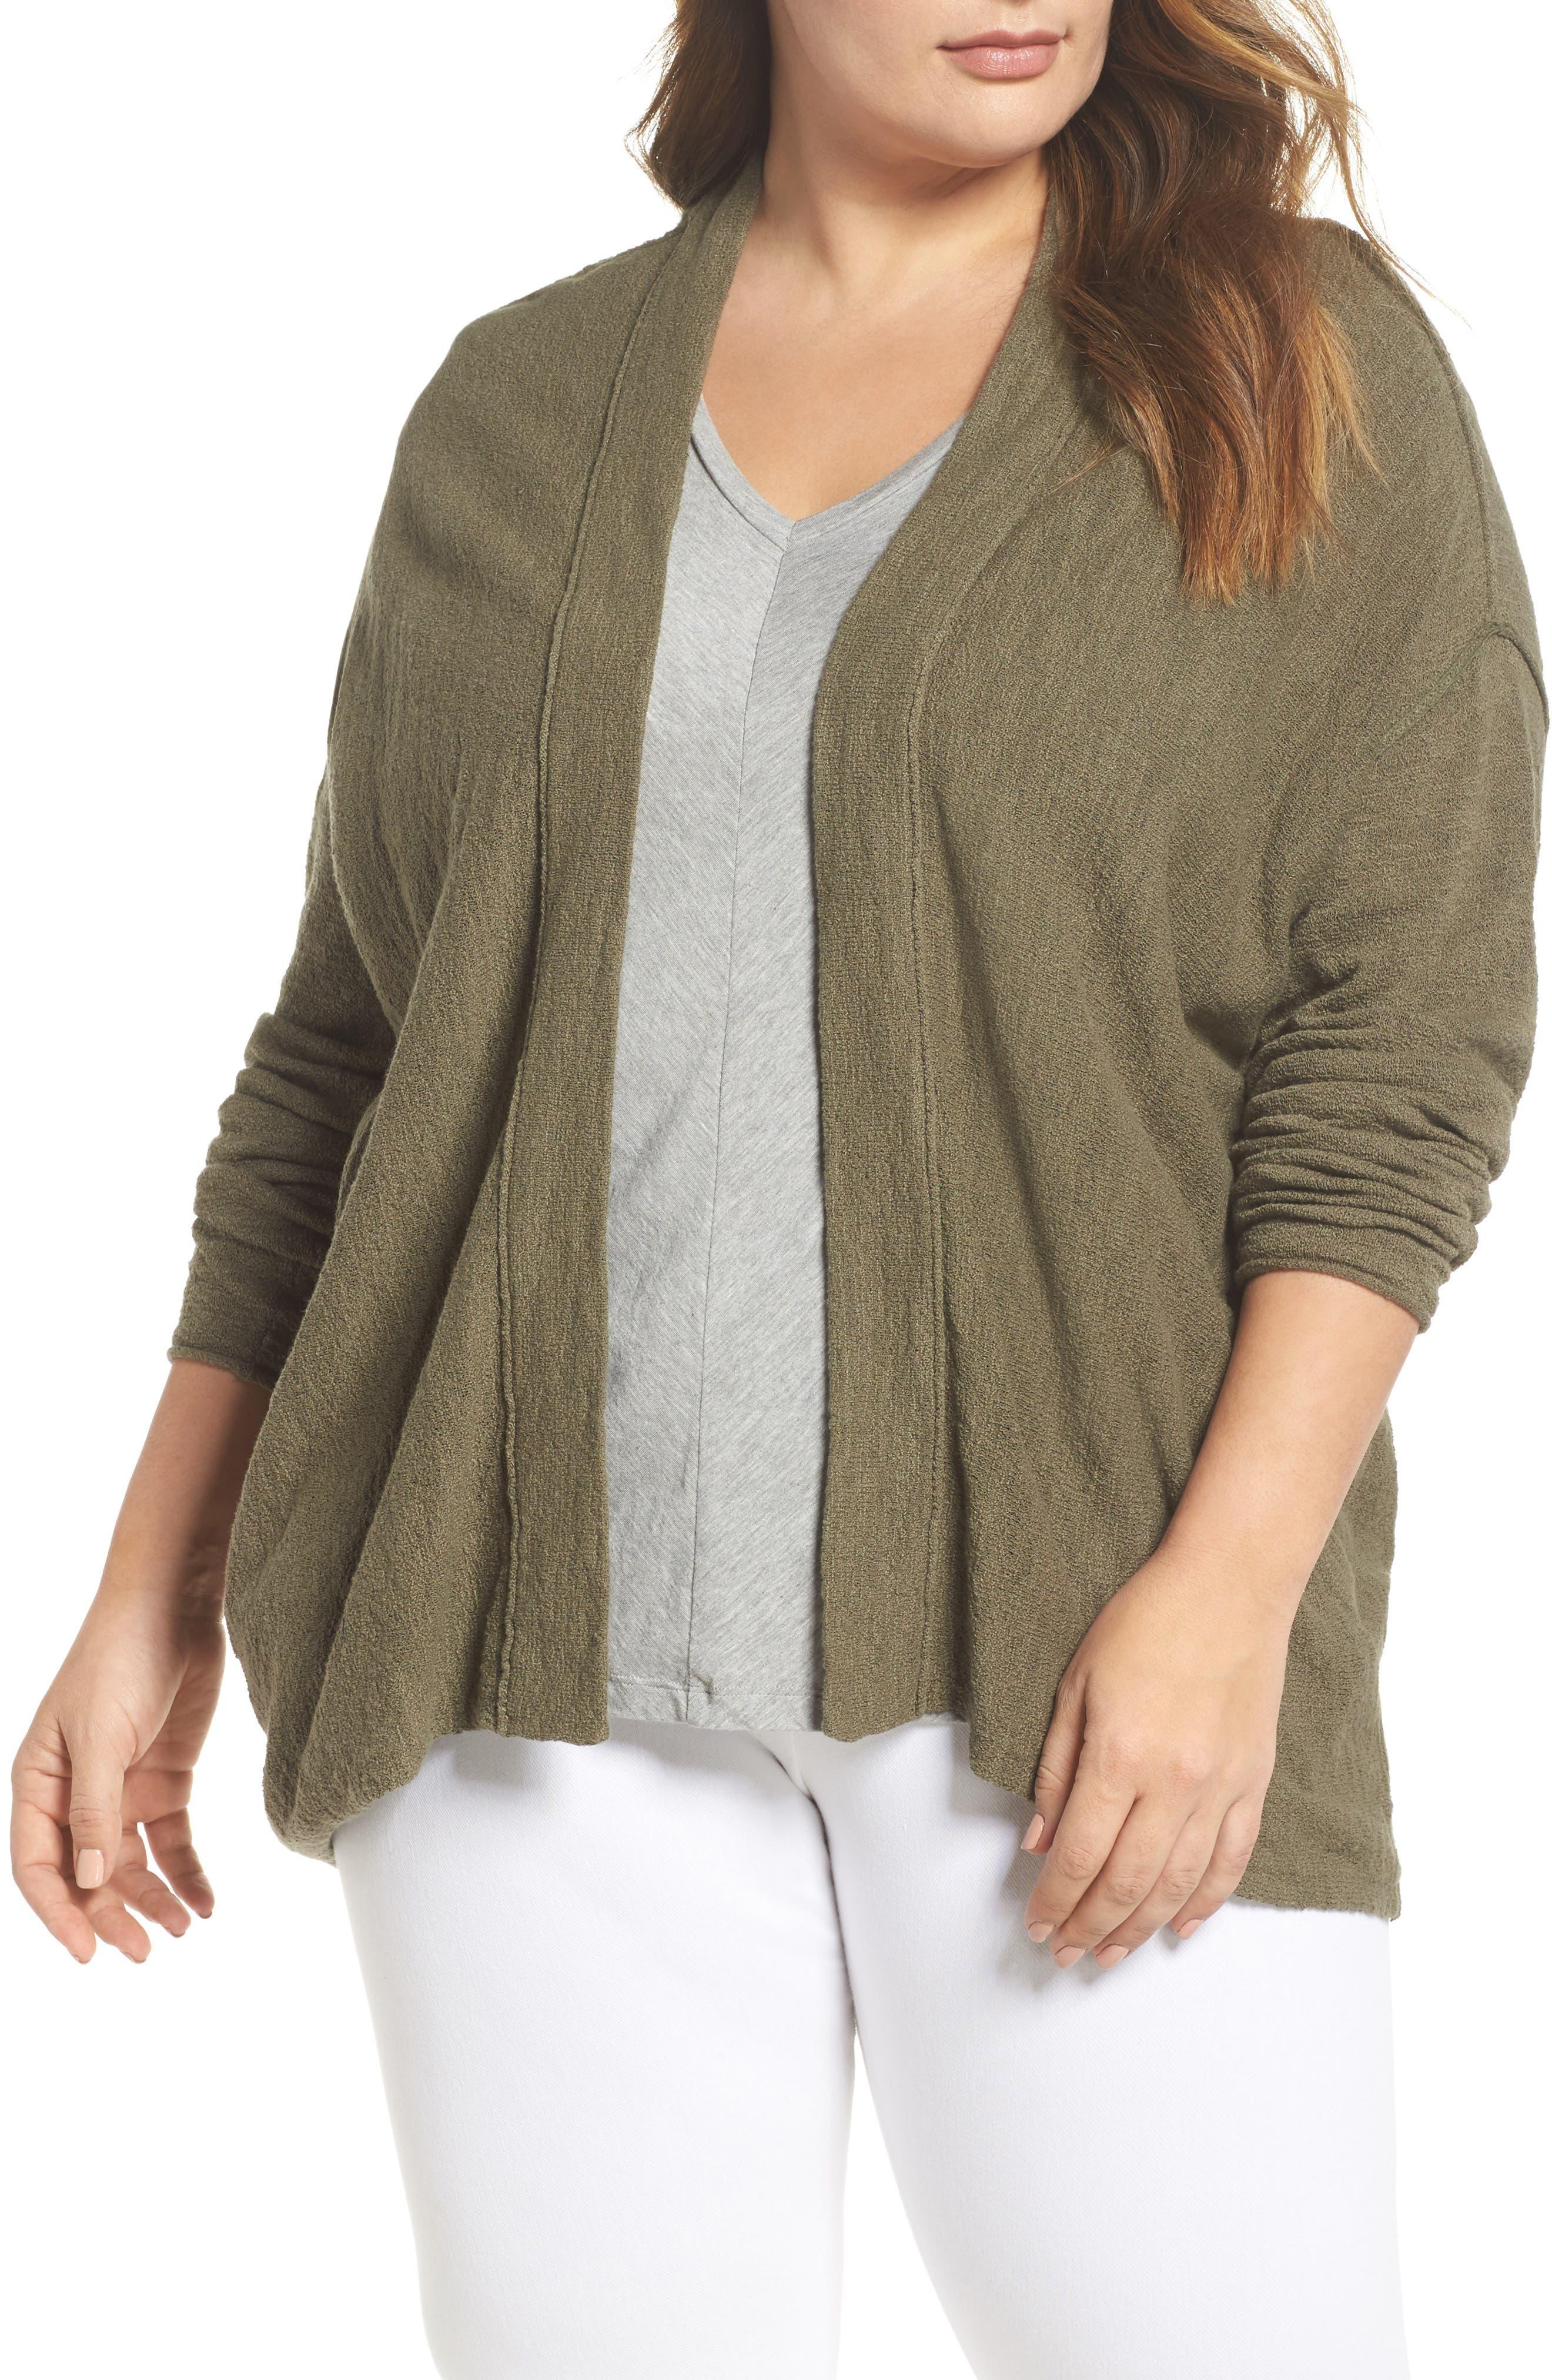 Drop Shoulder Cardigan,                         Main,                         color, Olive Kalamata